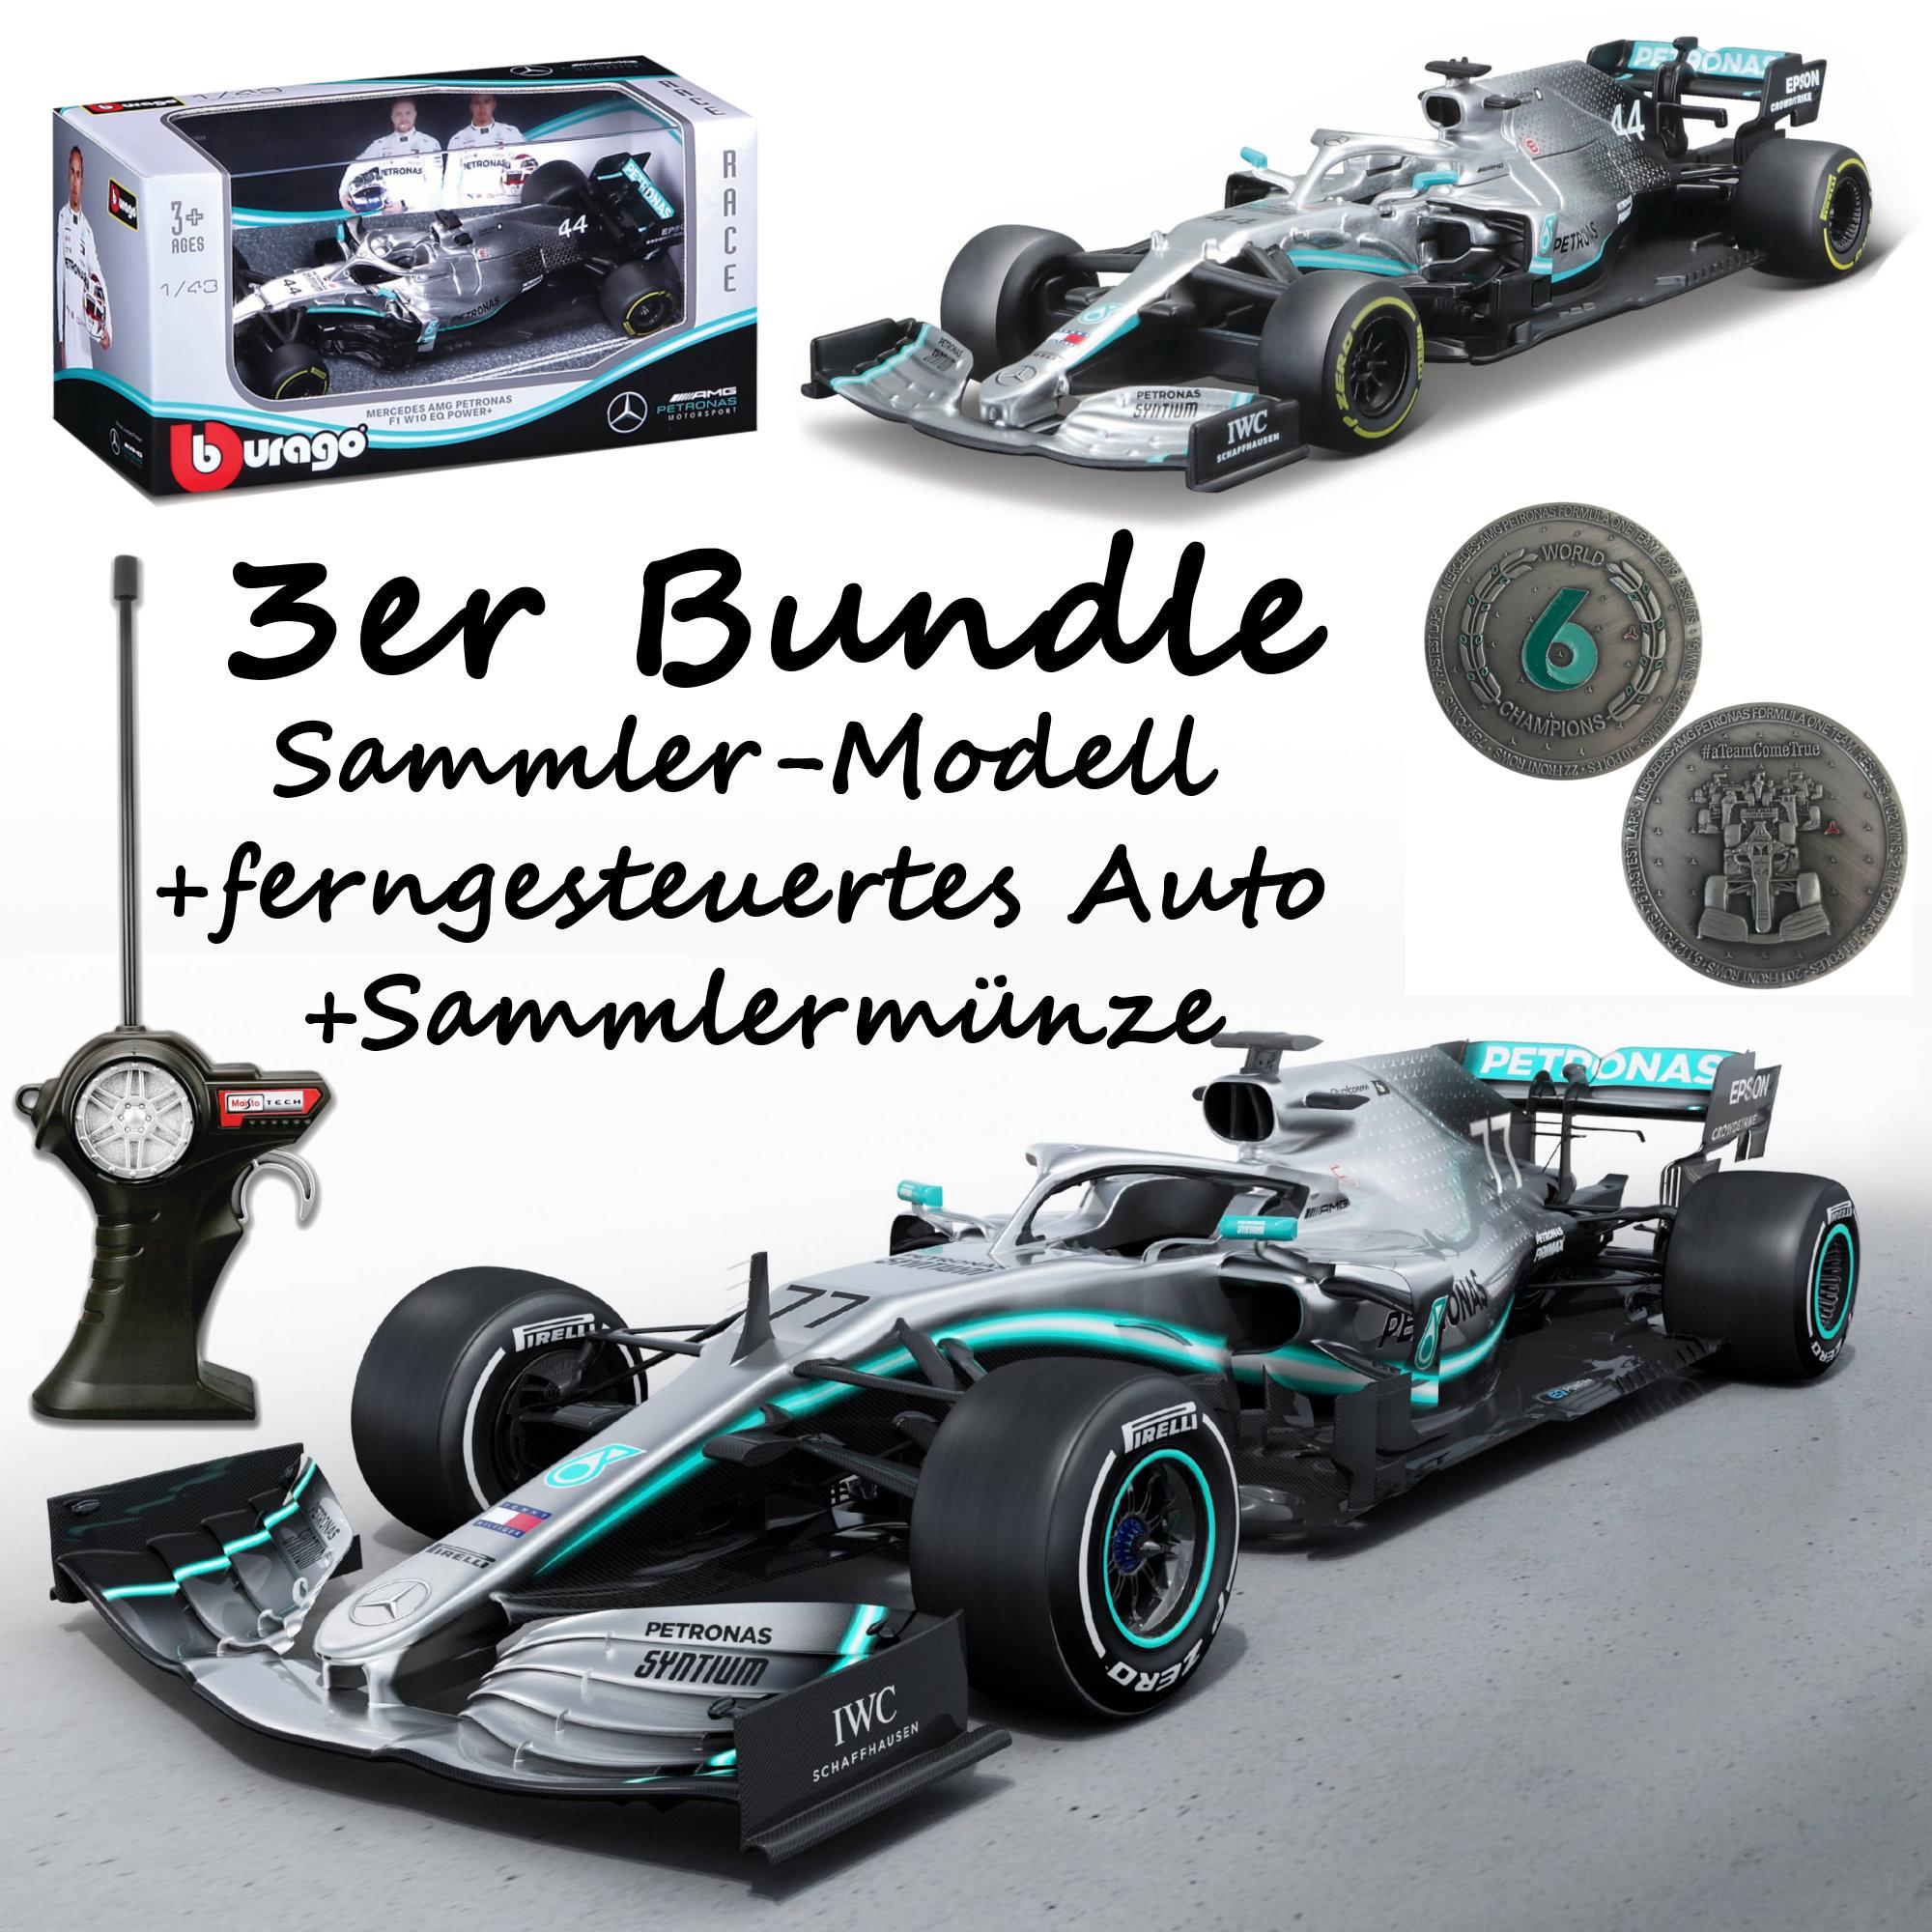 F1 Mercedes AMG Petronas Bundle - 1x R/C Modell + 1x Sammlermodell + Sammlermünze